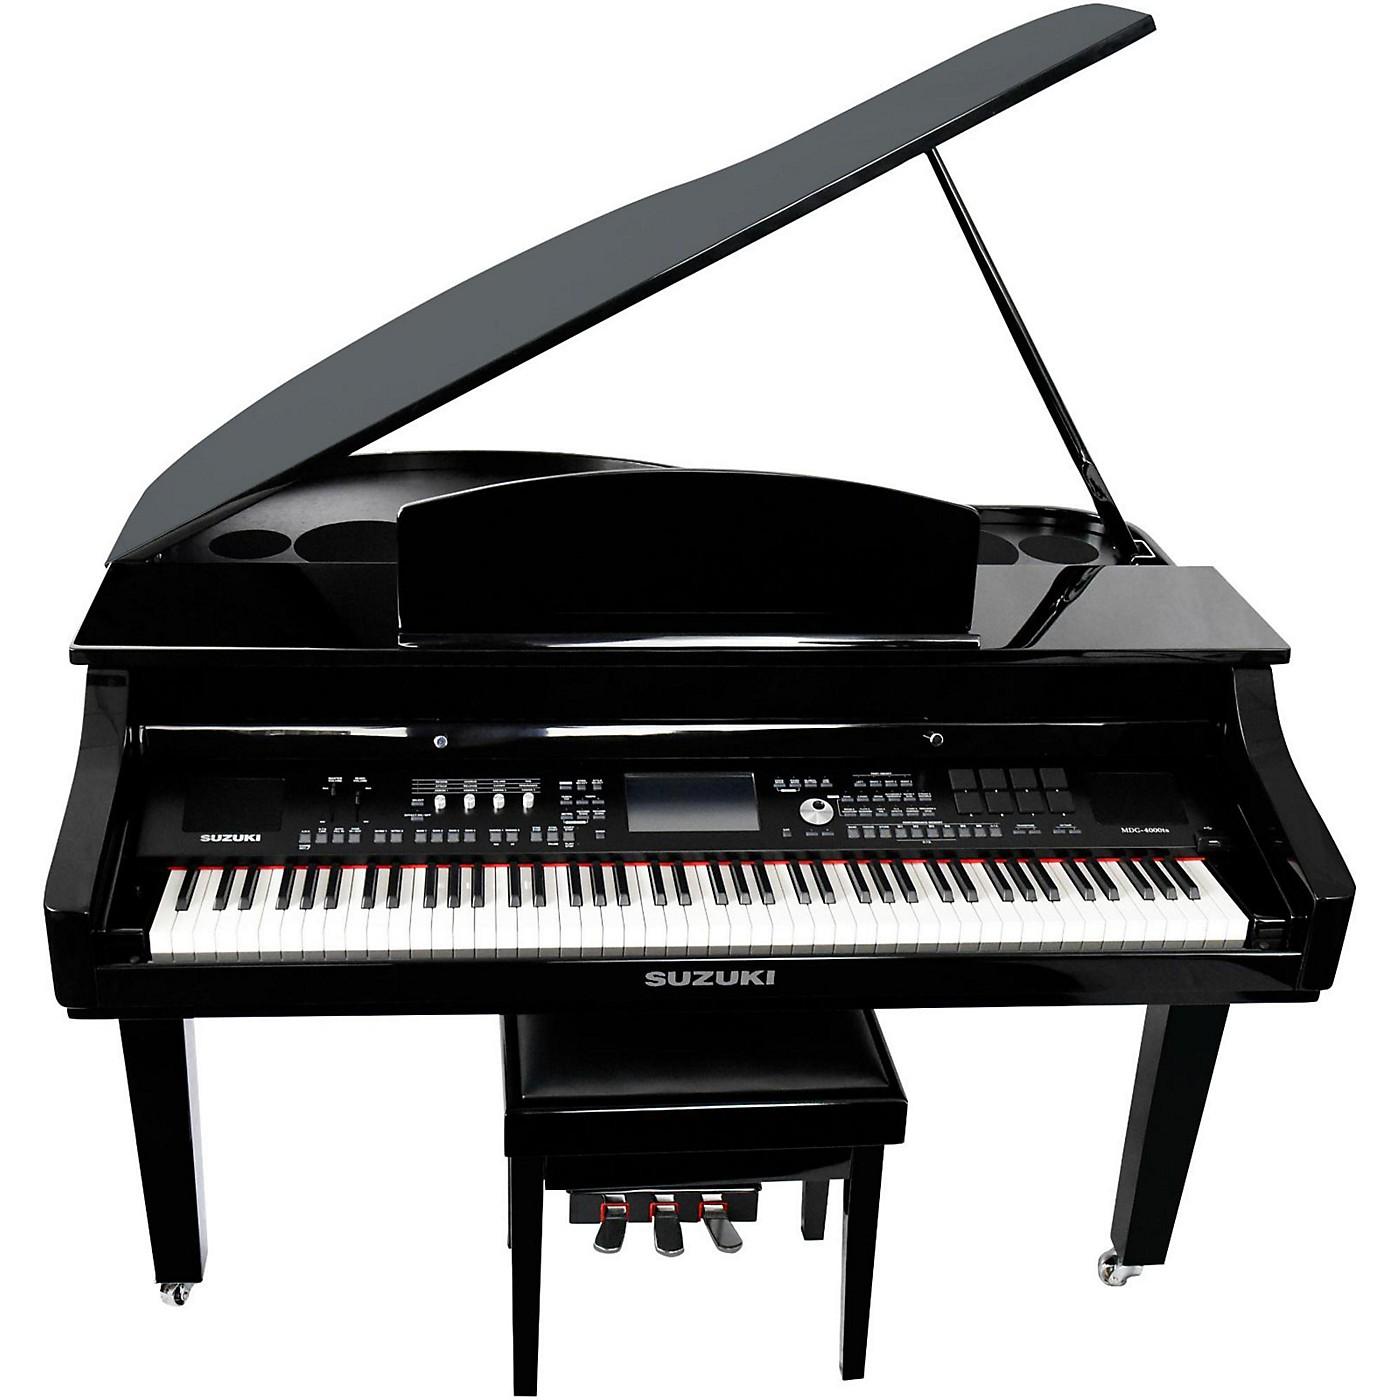 Suzuki MDG-4000ts TouchScreen Baby Grand Digital Piano thumbnail